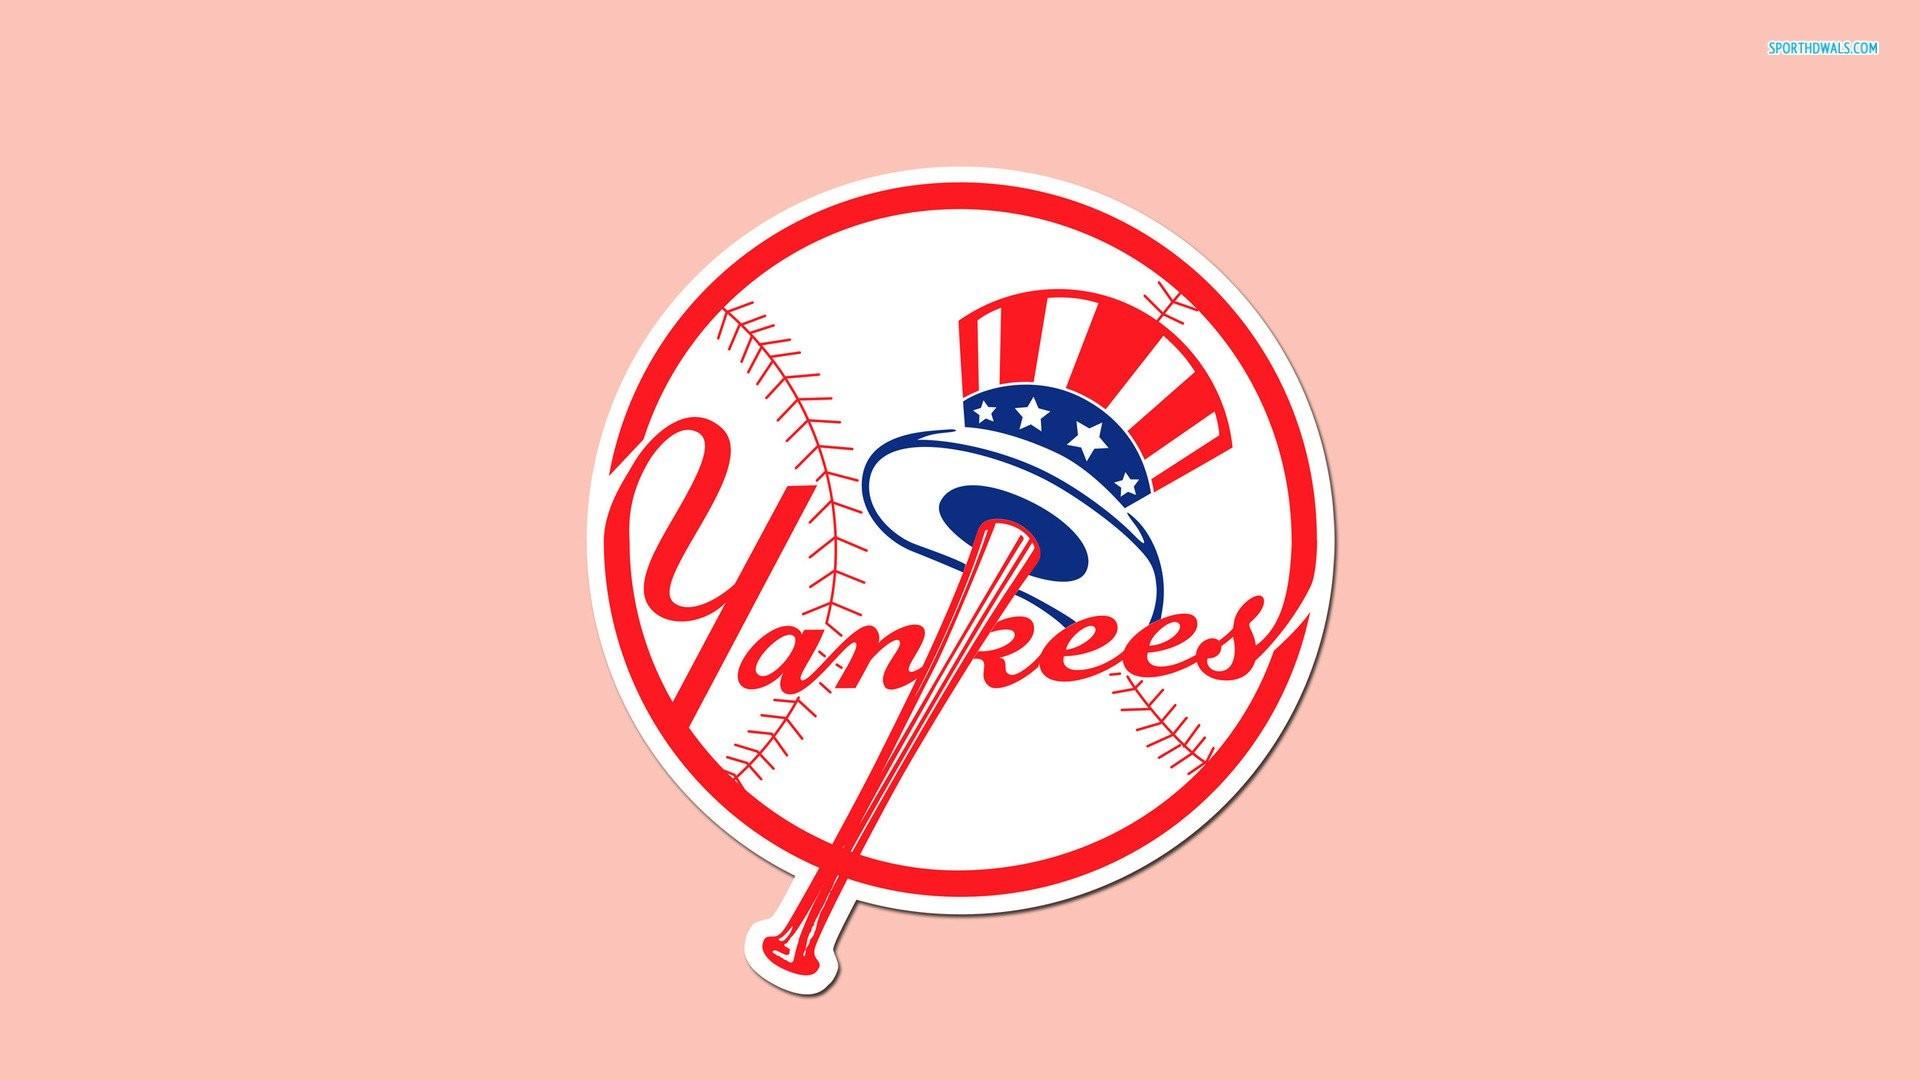 Official New York Yankees Website MLBcom